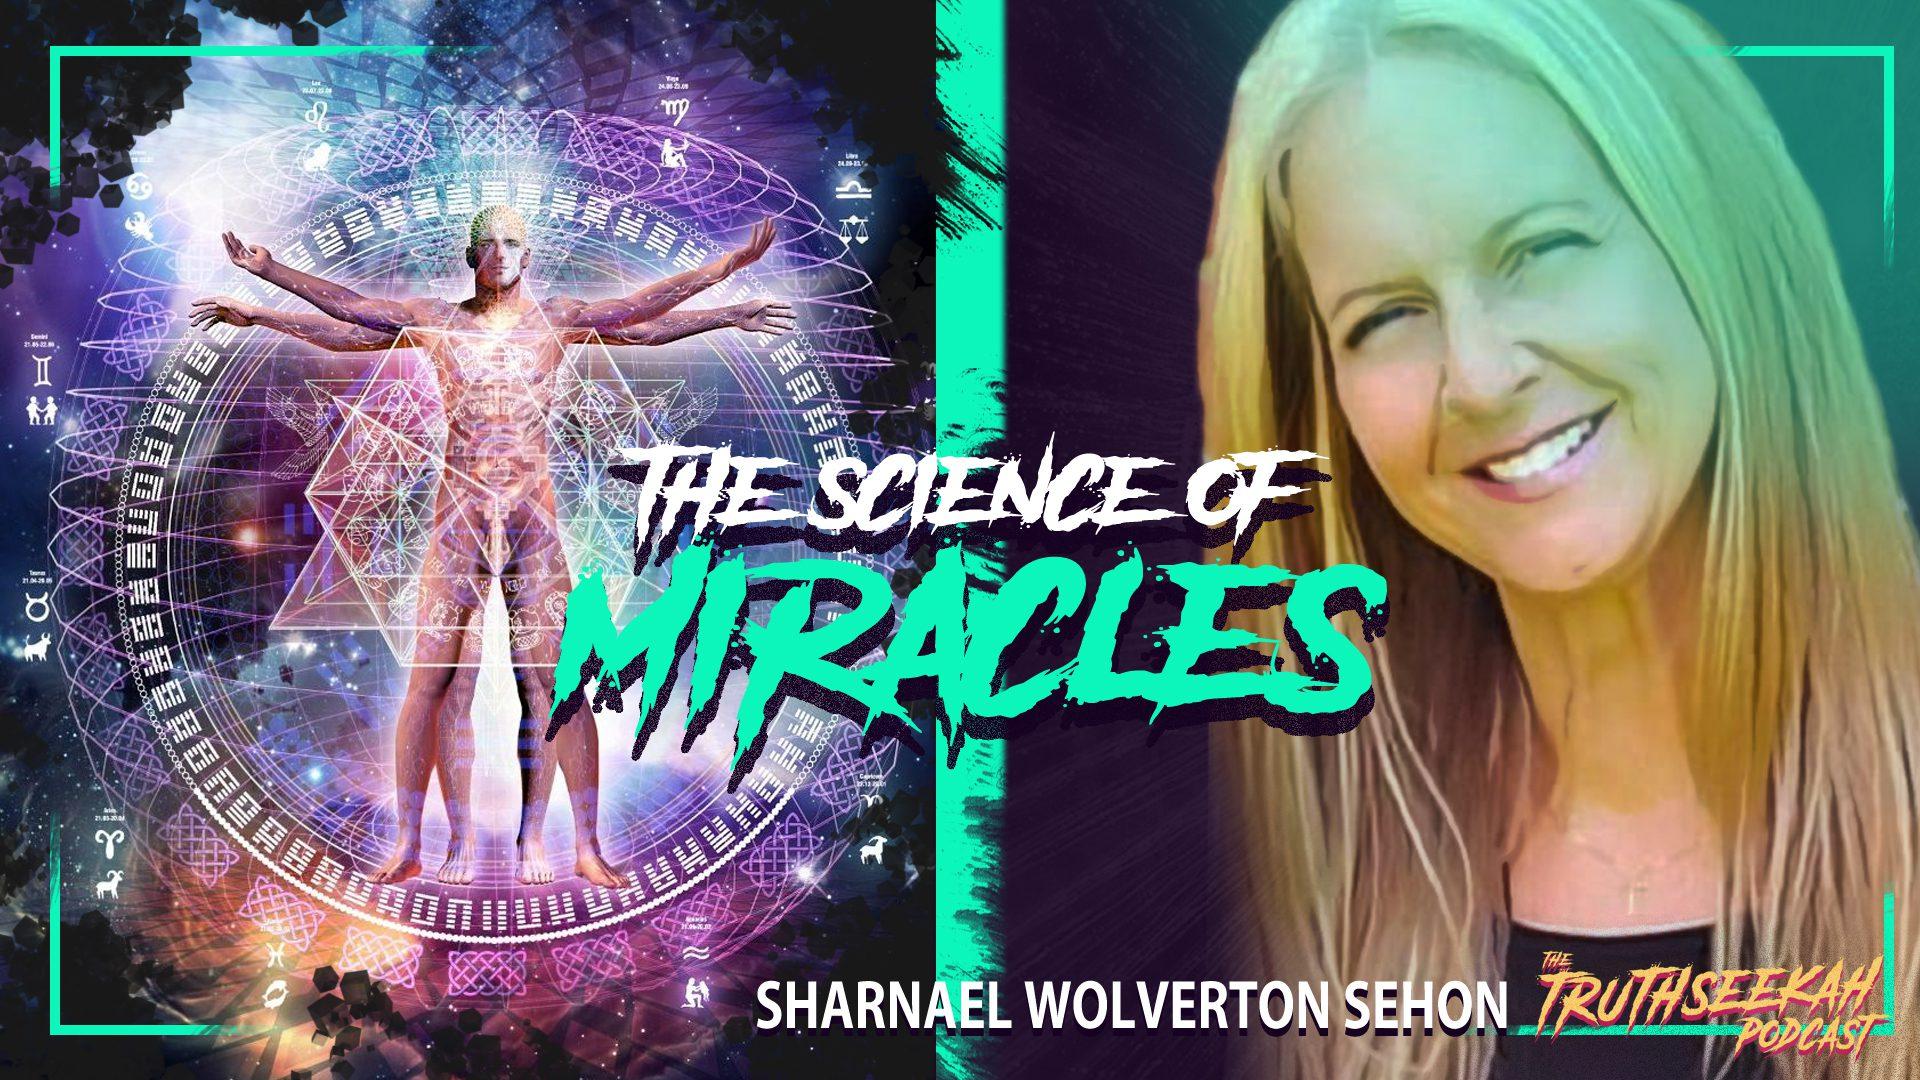 Dr. Sharnael Wolverton Sehon